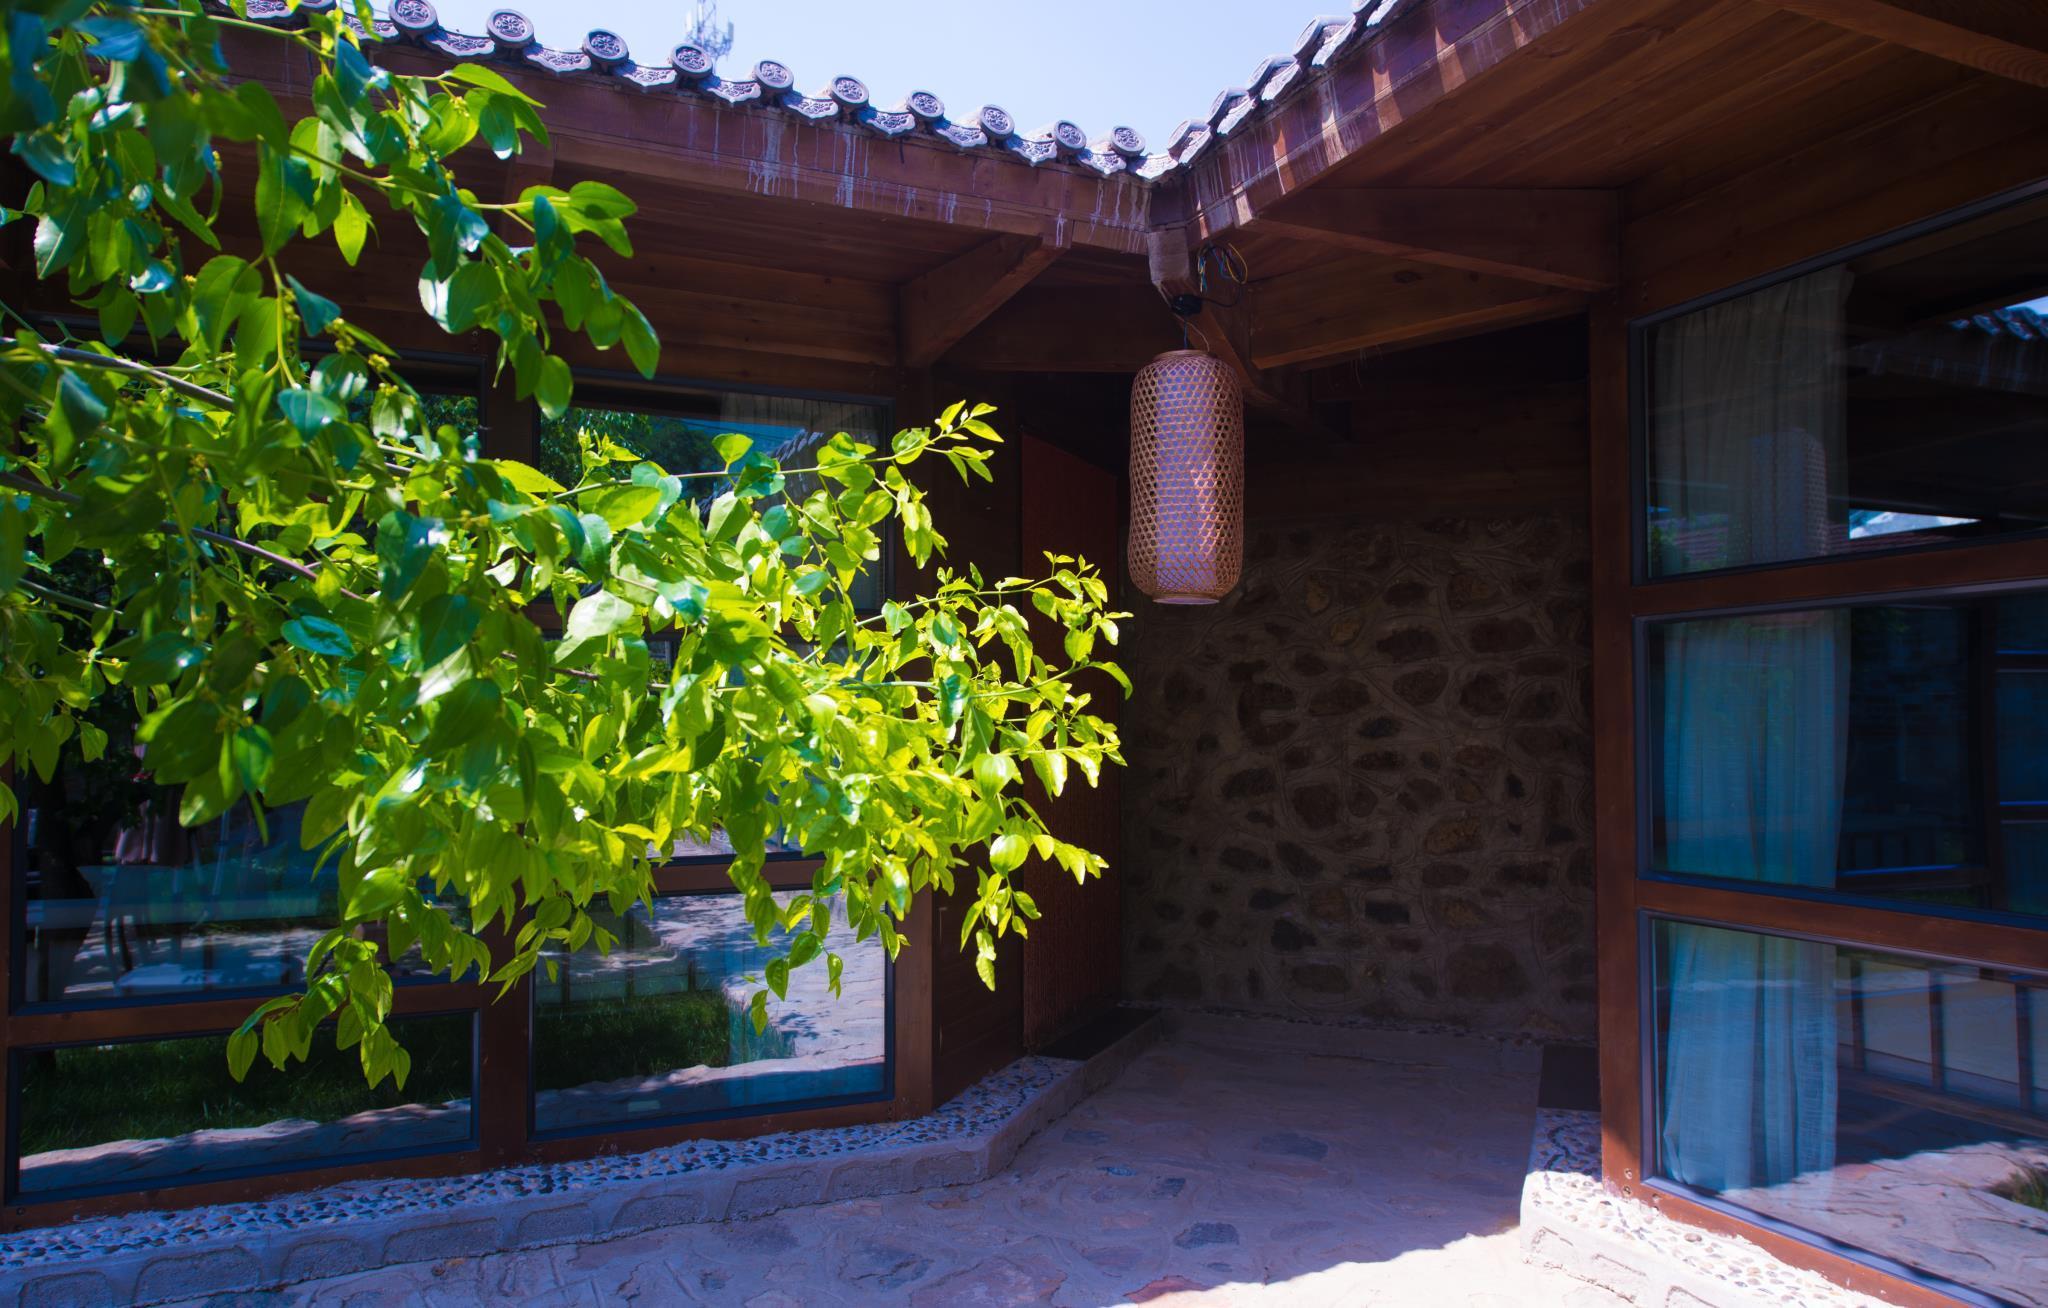 Beijing Badaling Stone Castle Country Hotel